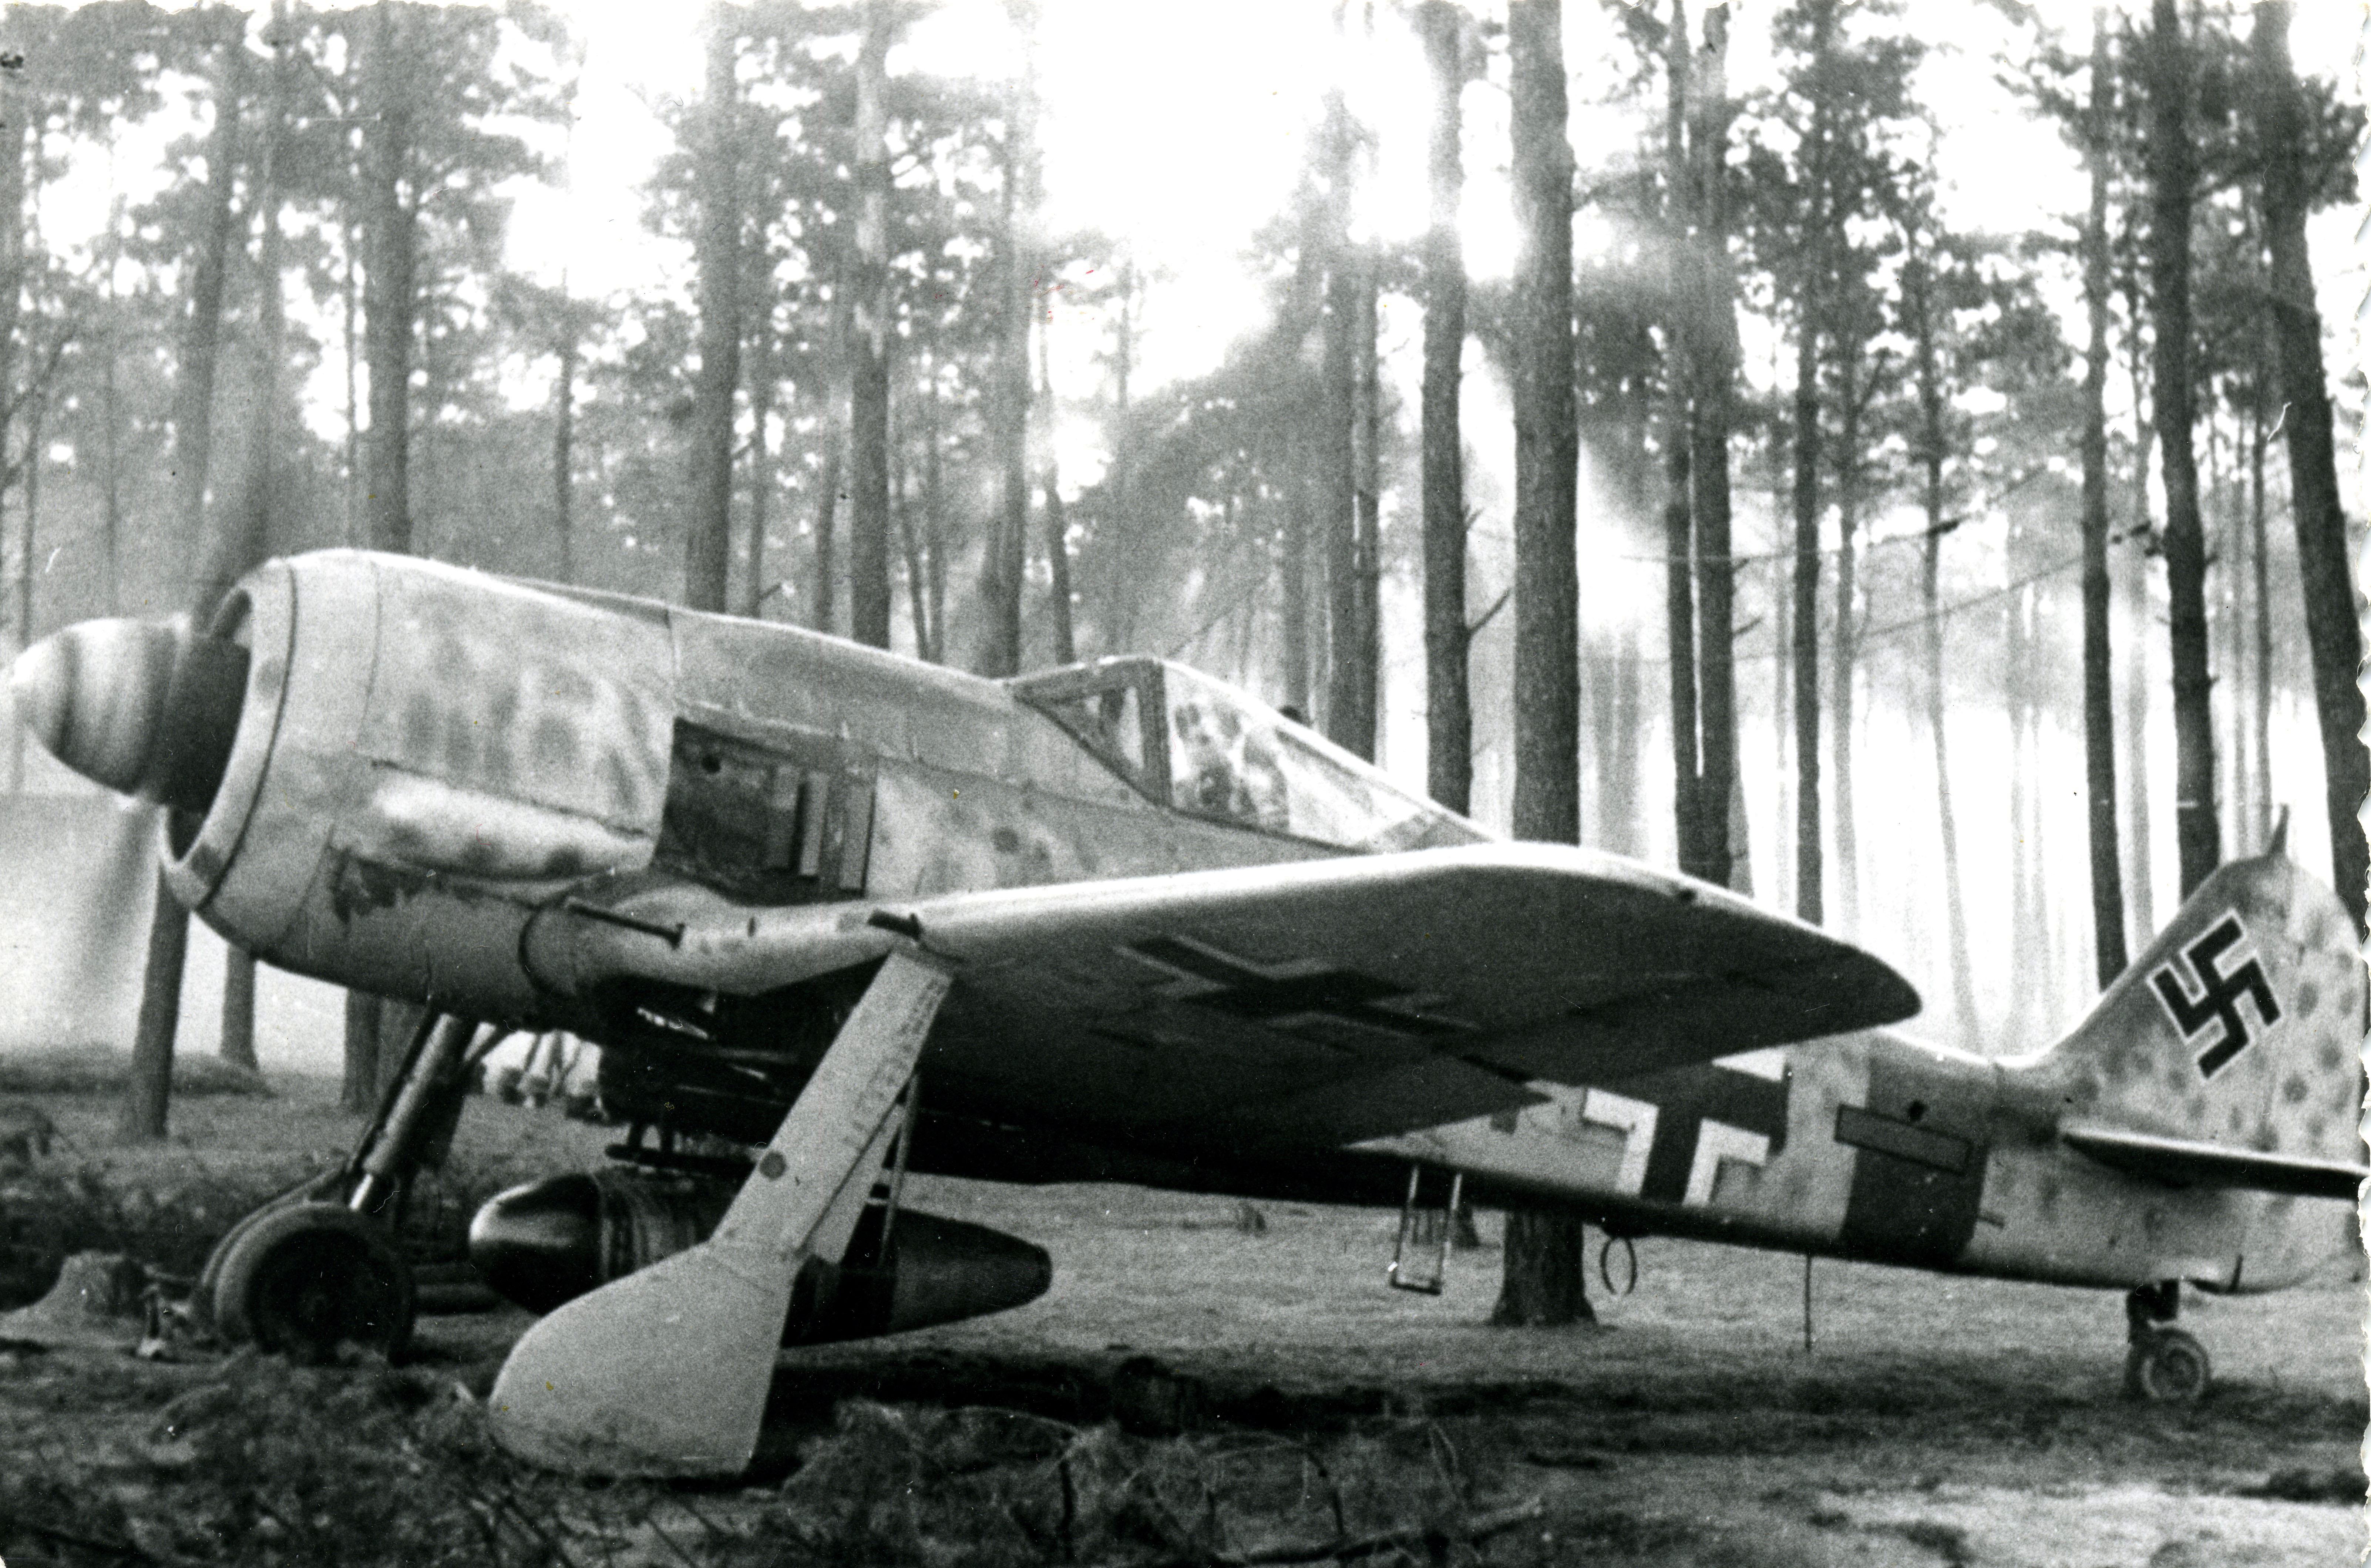 Focke Wulf Fw 190A8 5.JG300 Red 1 Klaus Bretschneider M499 Germany 1944 01